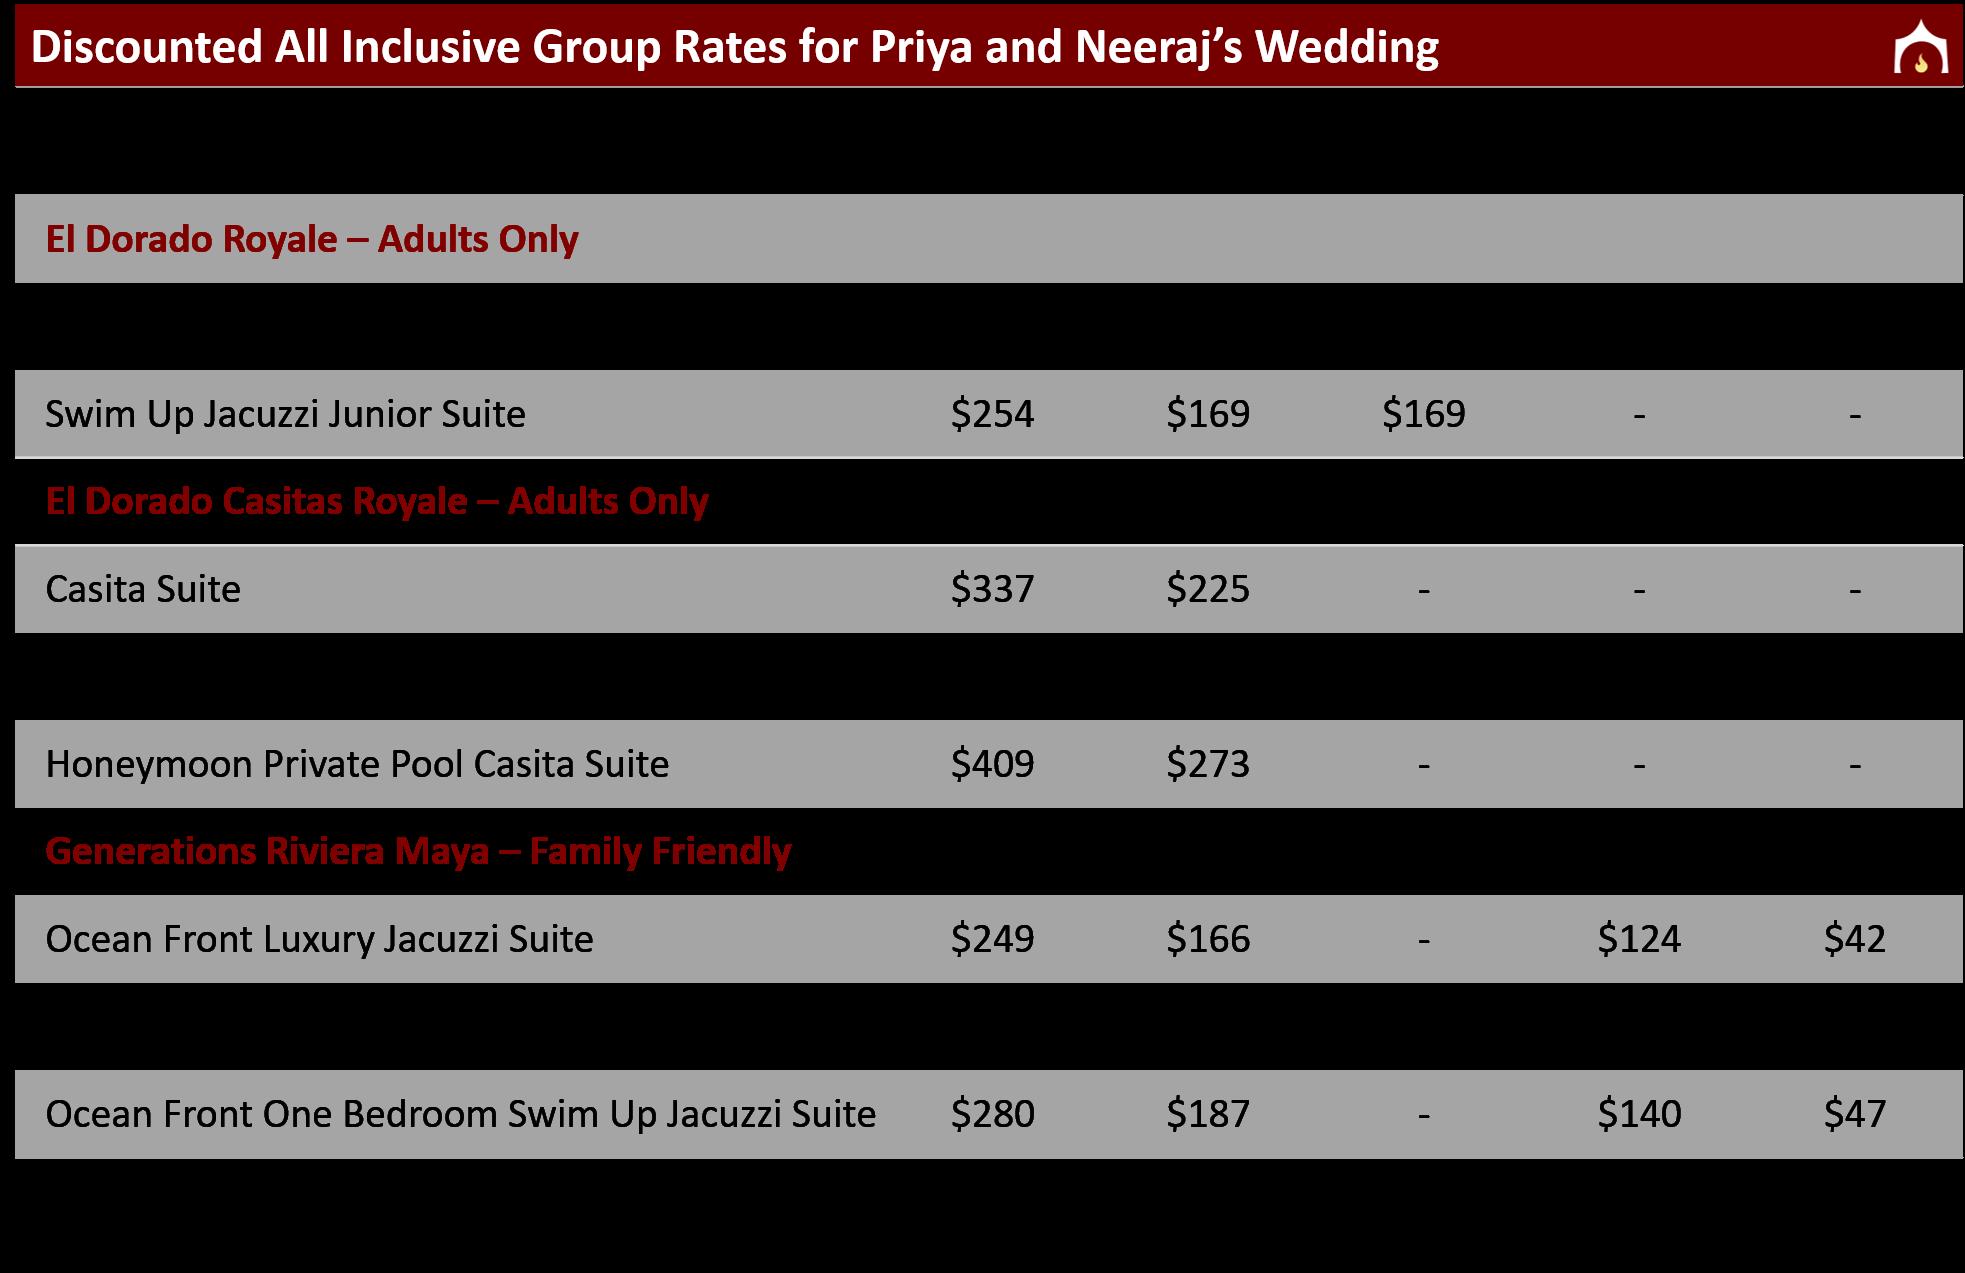 Priya and Neeraj Discounted Rates - Web.png